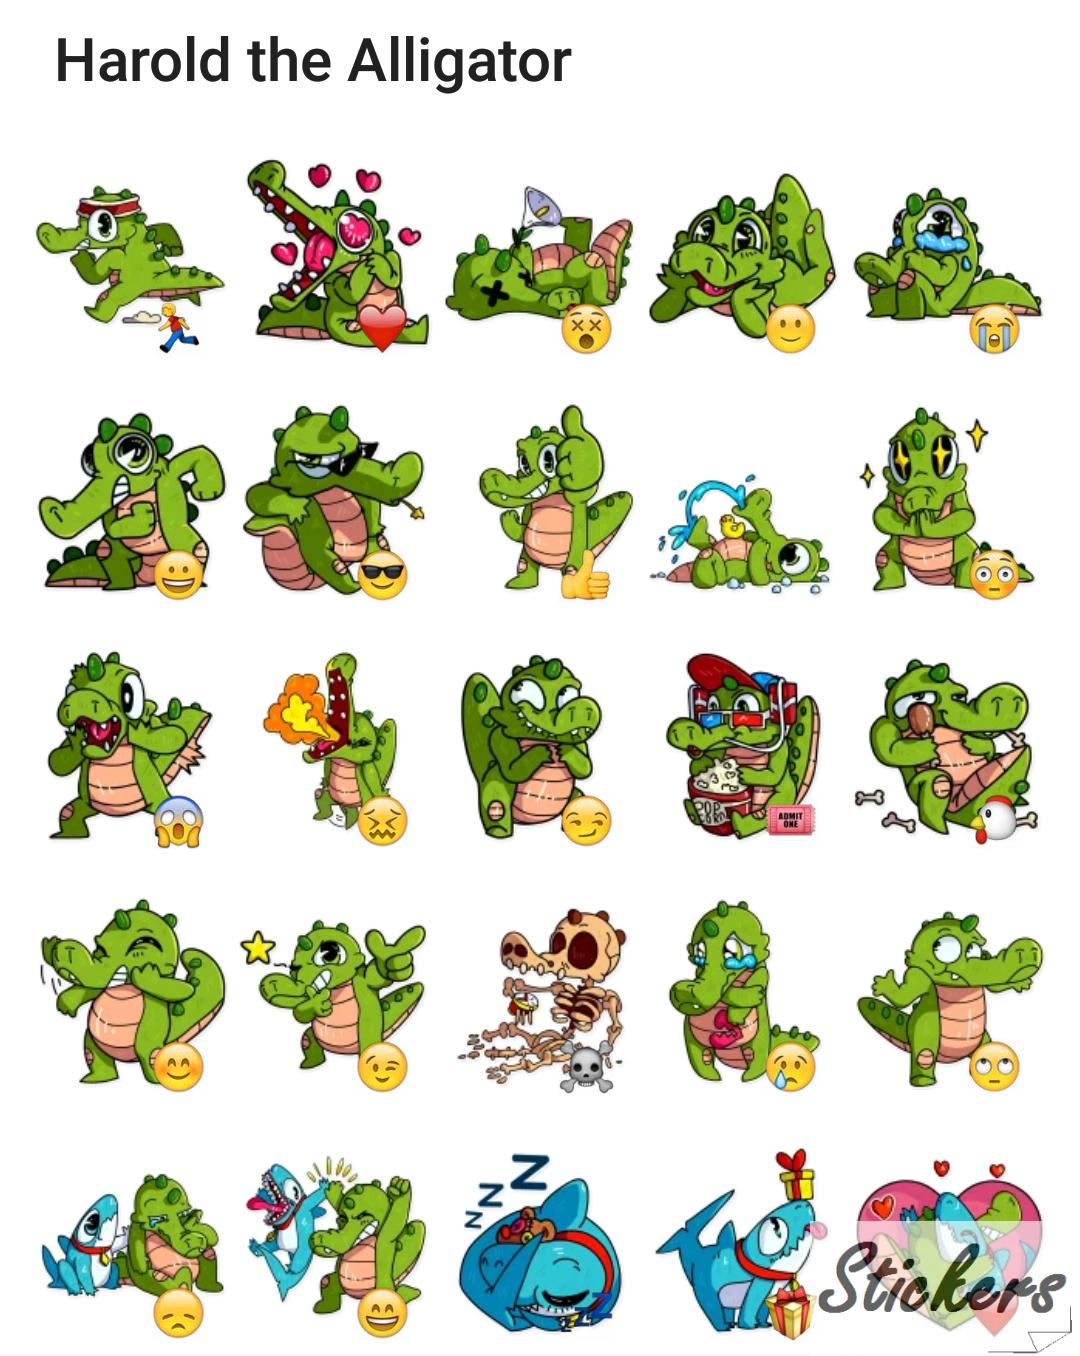 Harold the Alligator Telegram sticker set